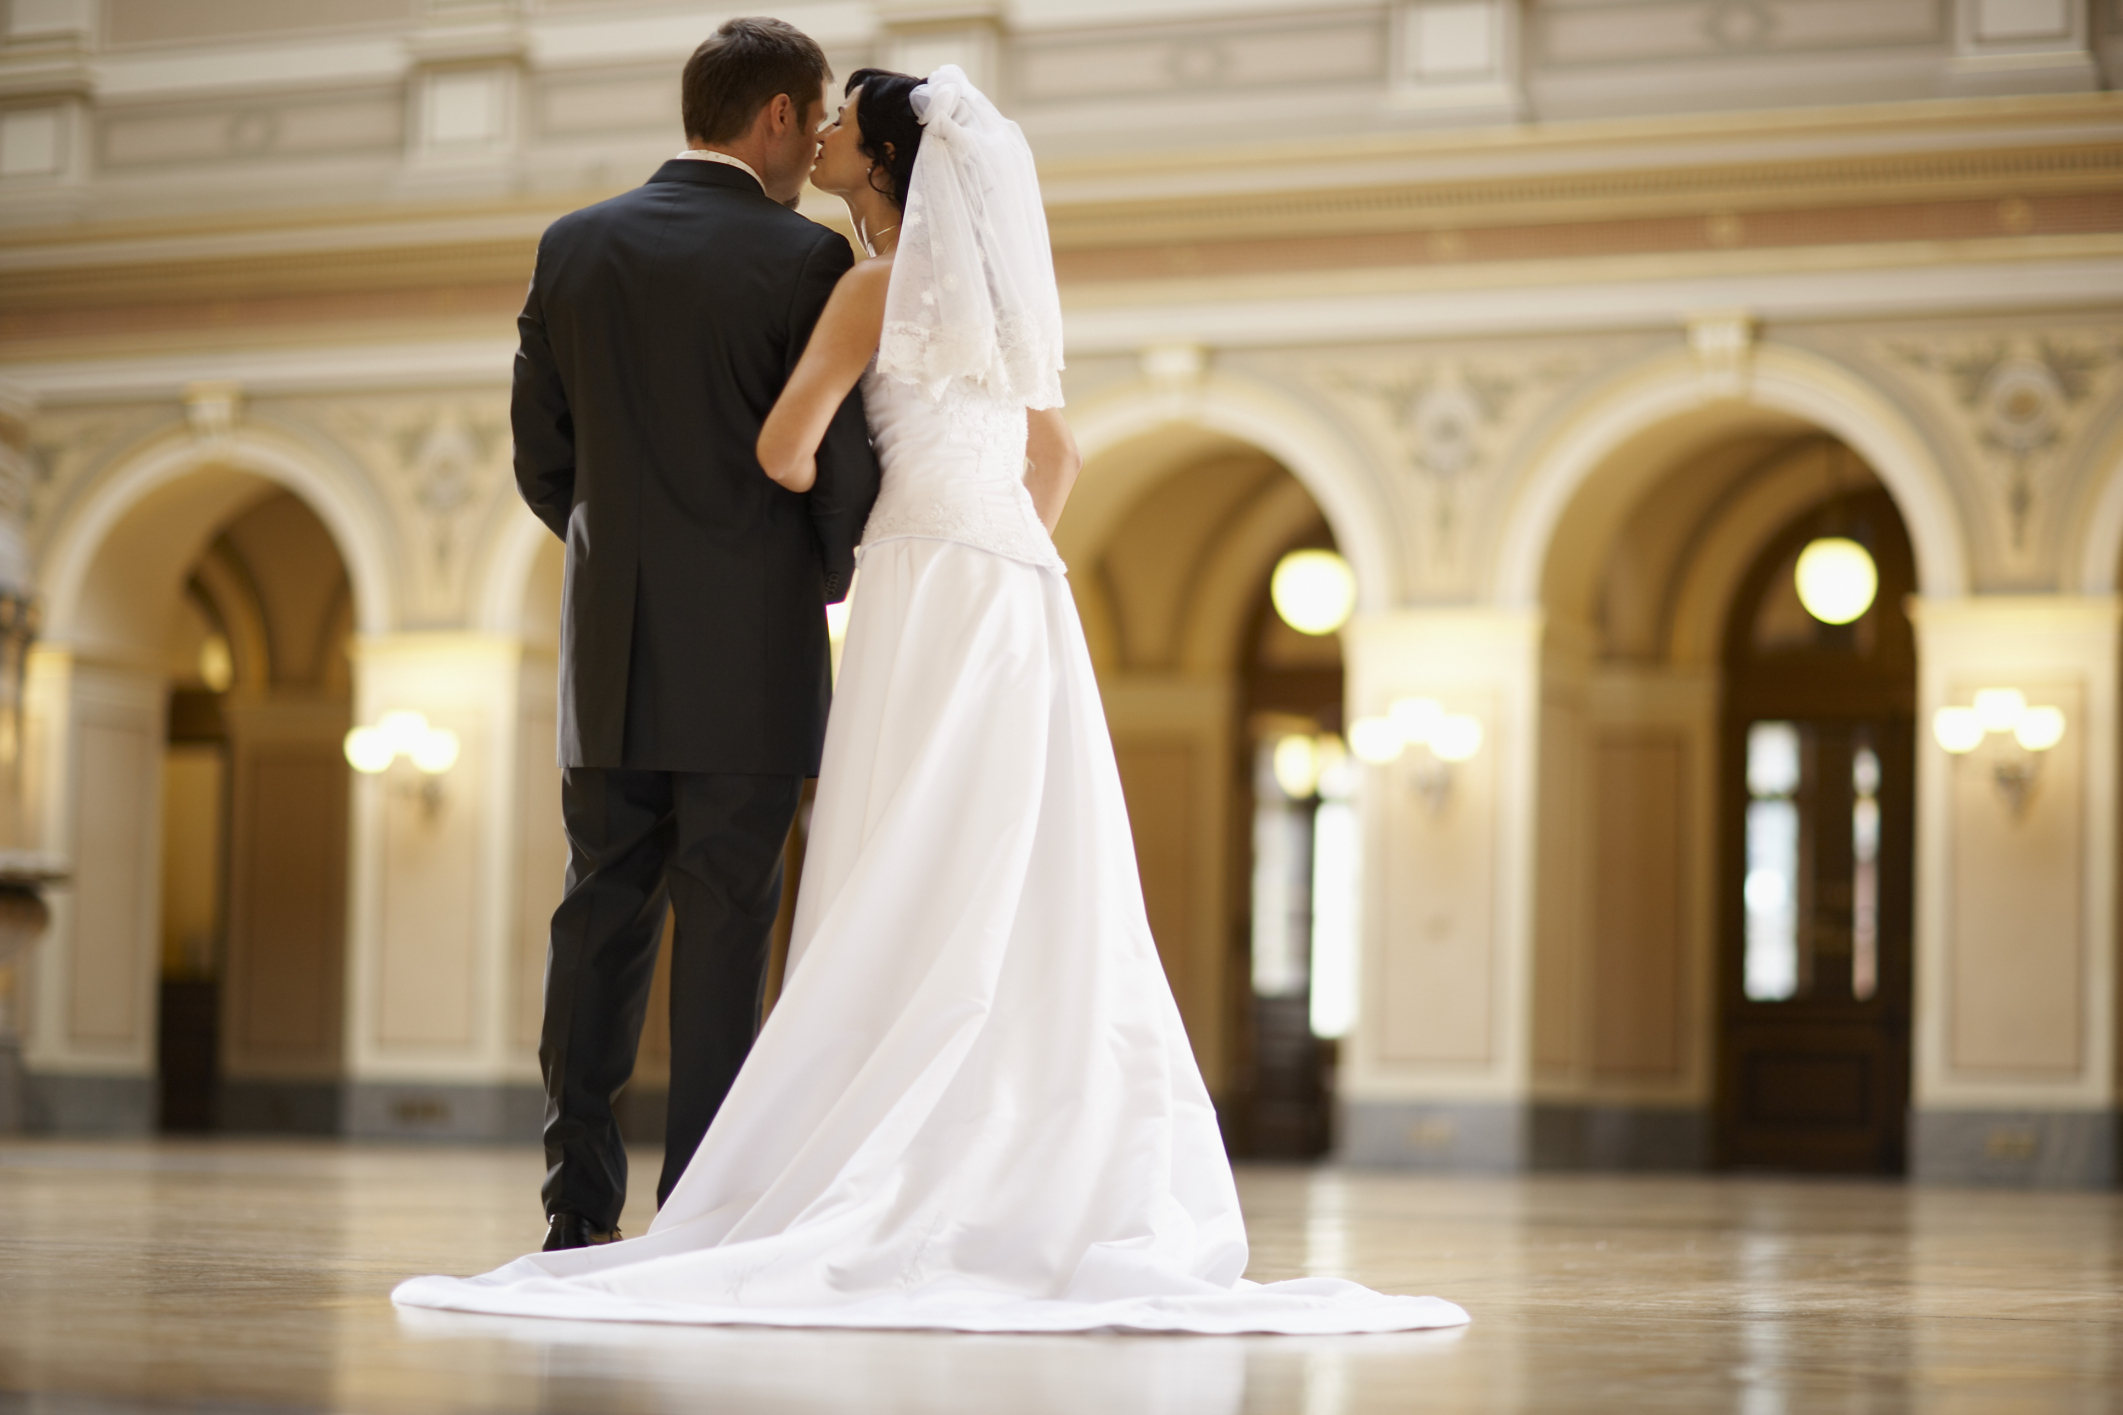 Reception Entrance Music Articles Easy Weddings